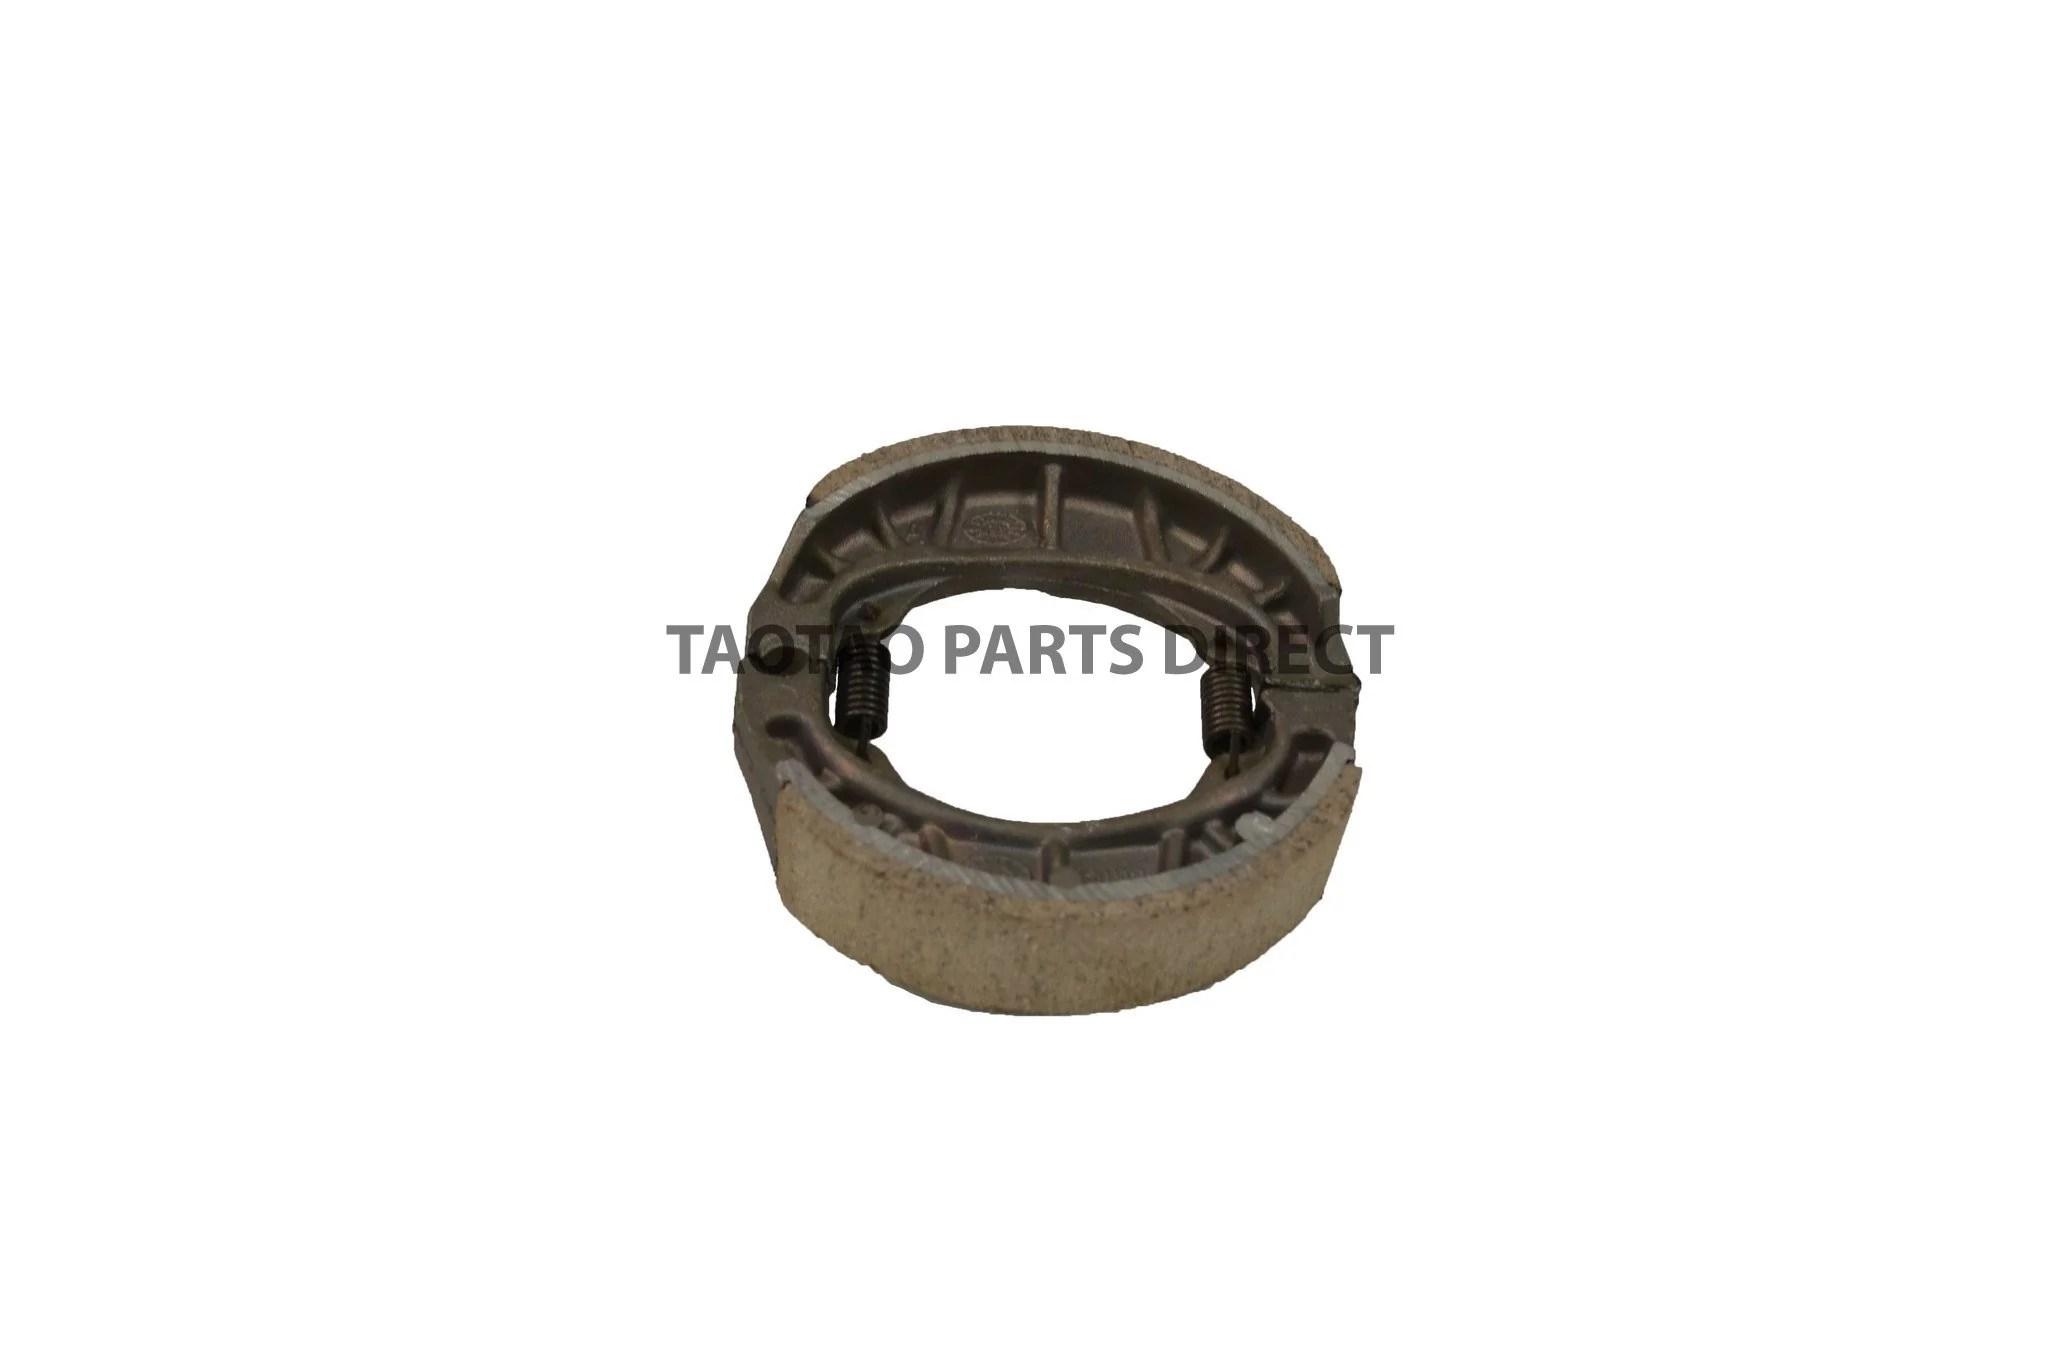 medium resolution of 49cc brake shoes taotaopartsdirect com